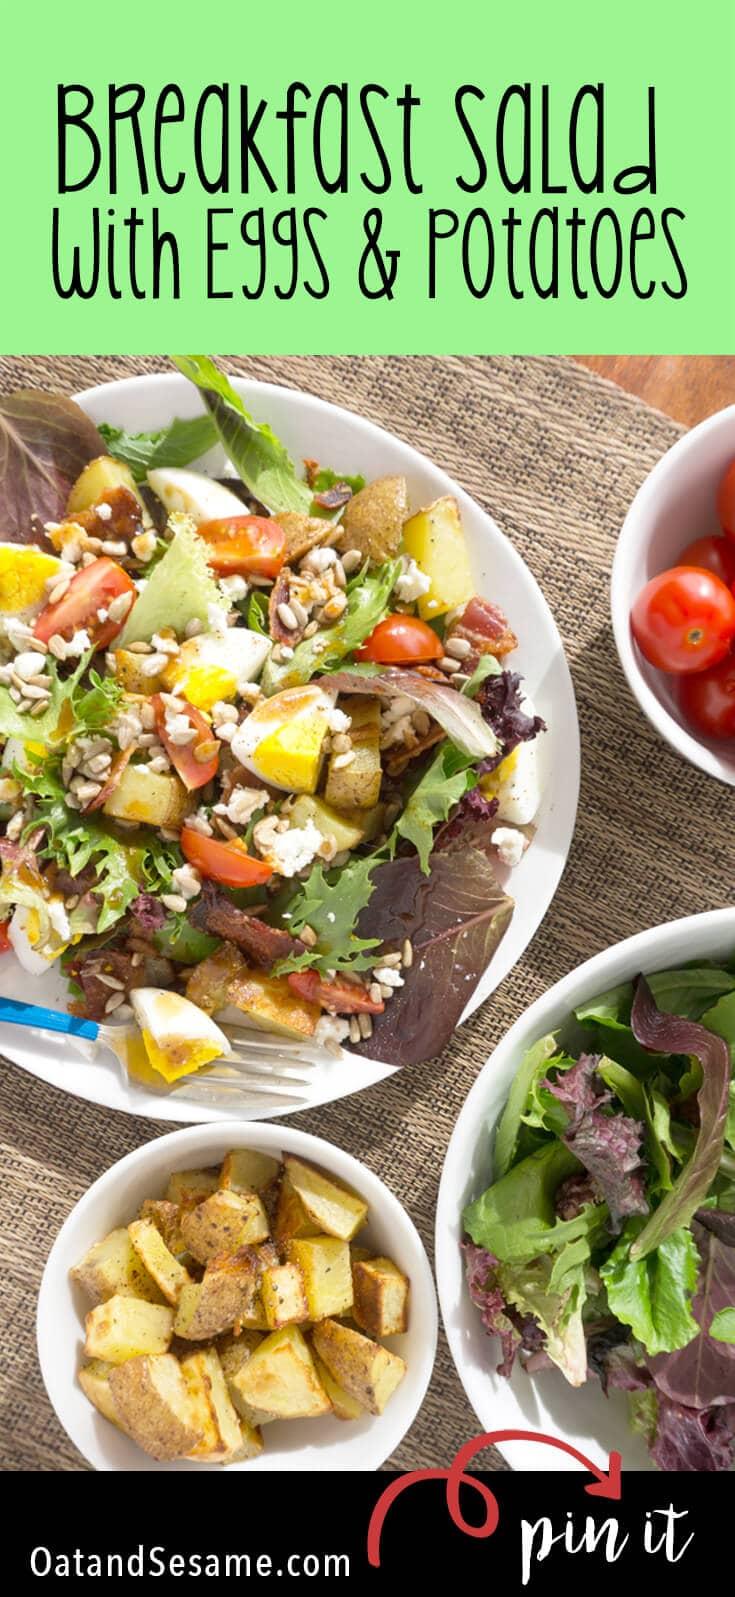 hard boiled eggs, salad greens, potatoes